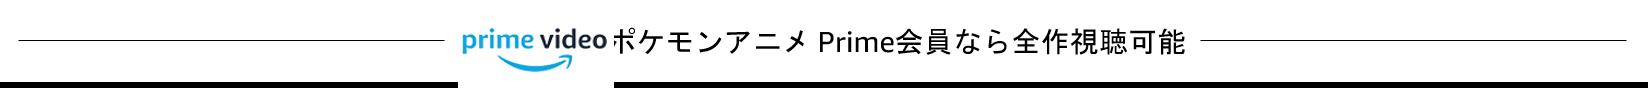 Prime Video ポケモンアニメ 全作配信